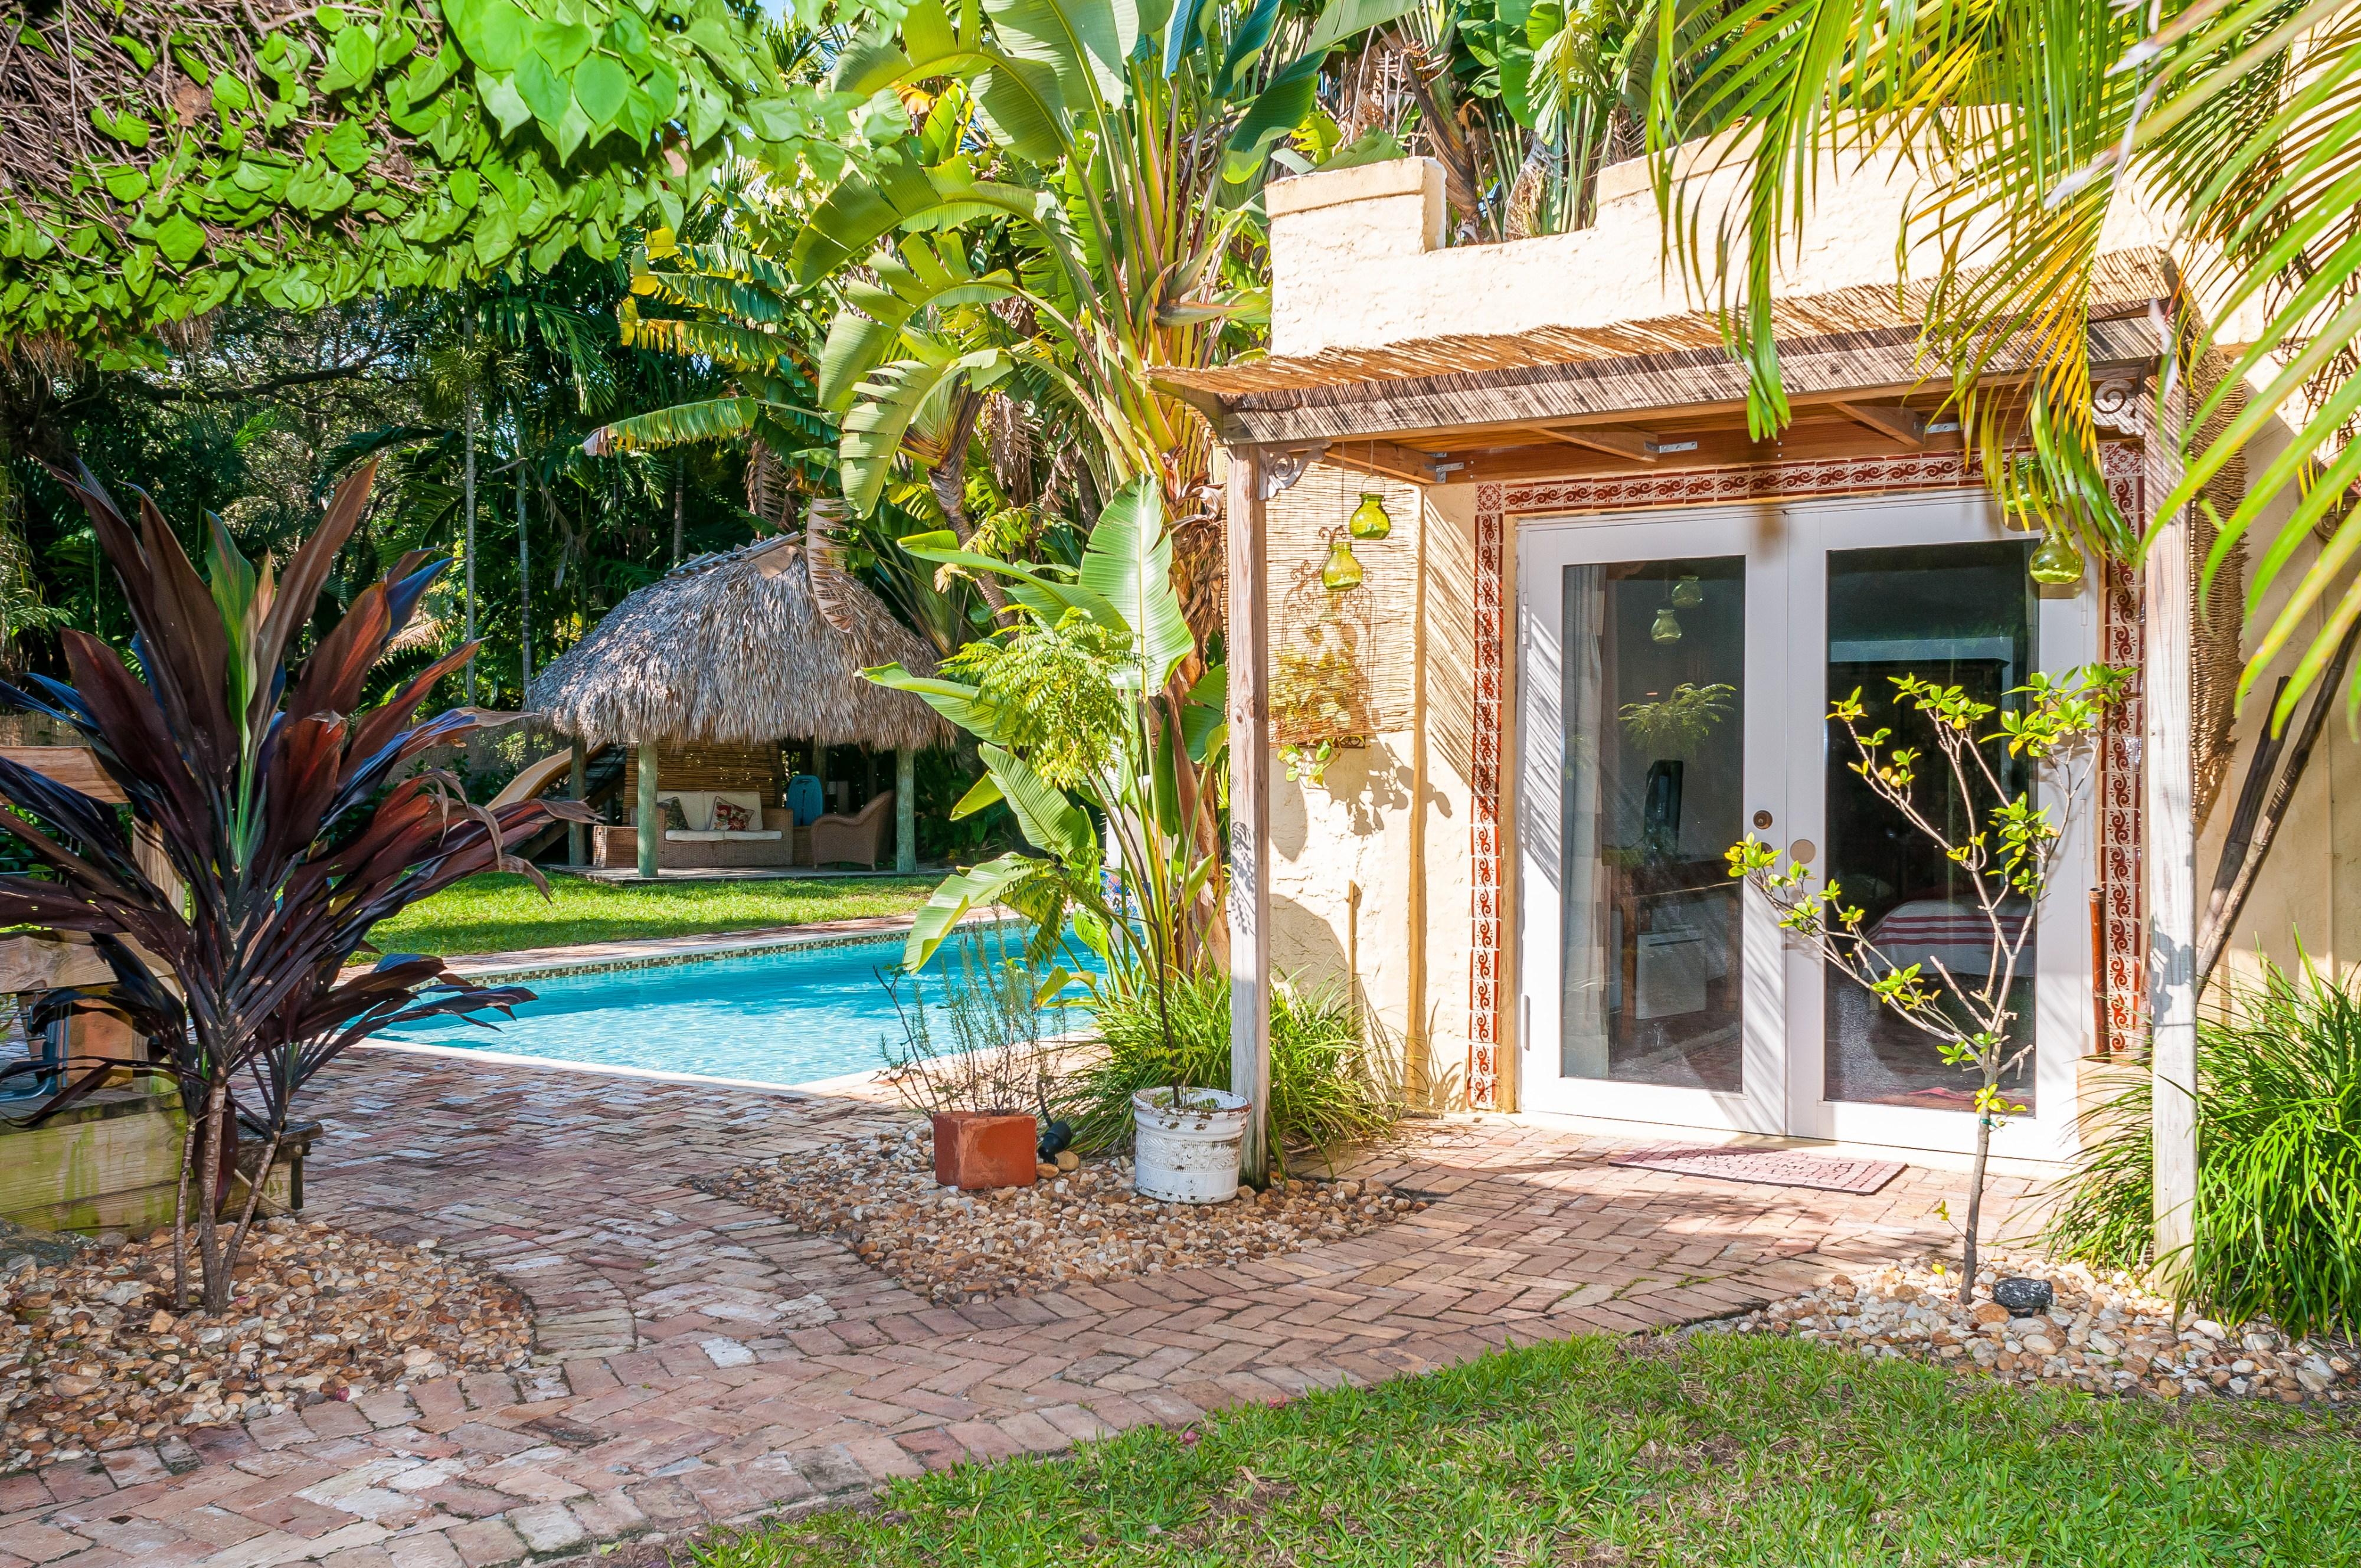 Poolside Listing – Cozy and charming cottage, Biscayne Park, FL 1